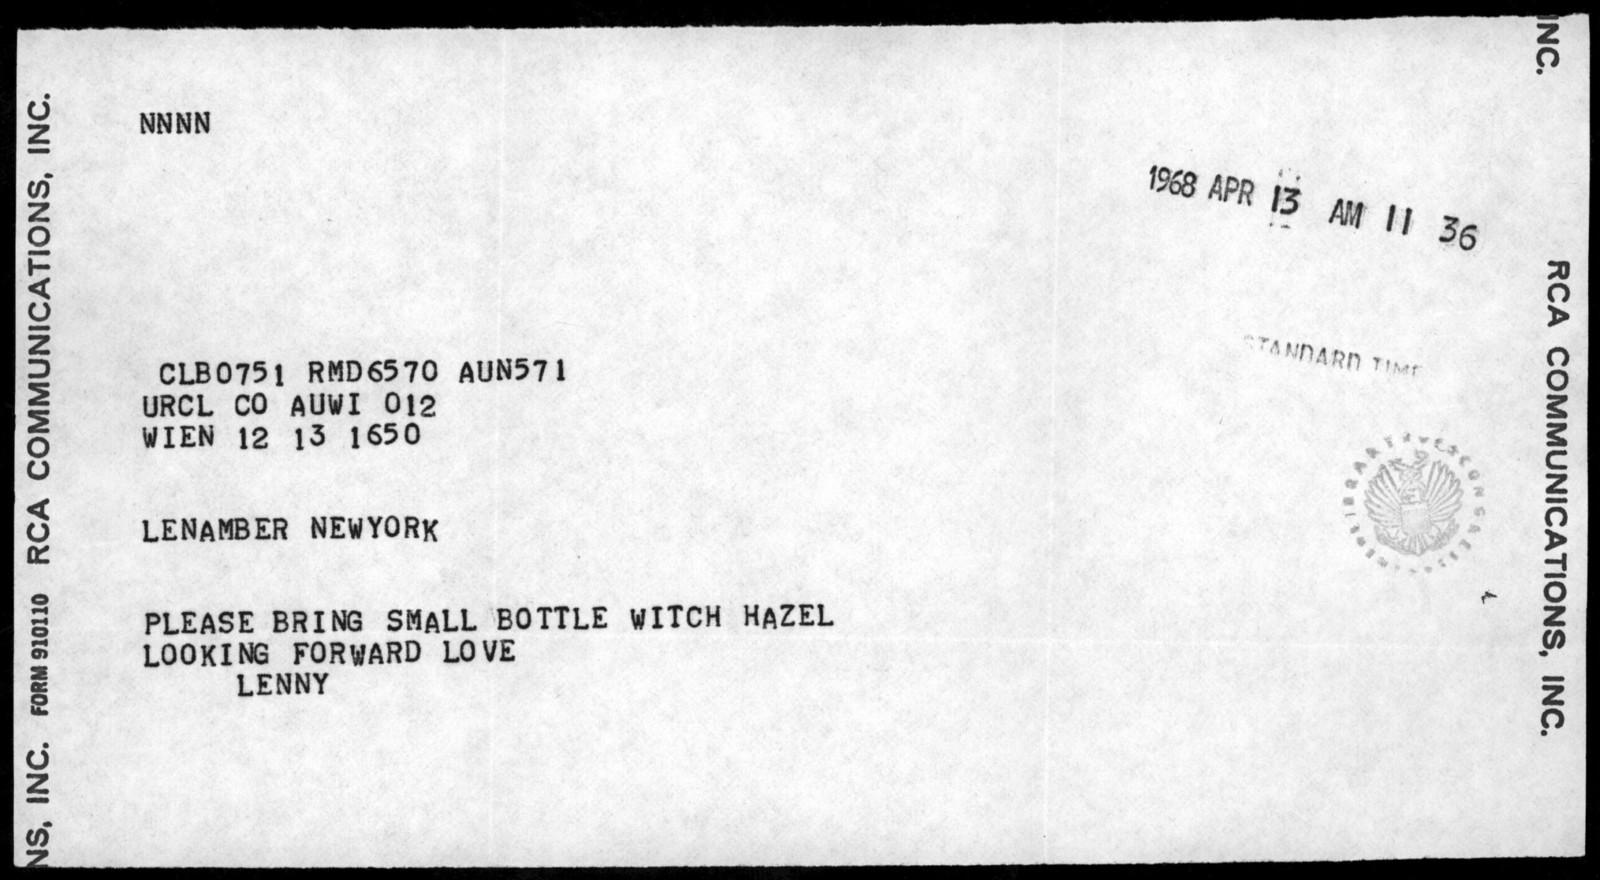 Letter from Leonard Bernstein to Helen Coates, April 13, 1968